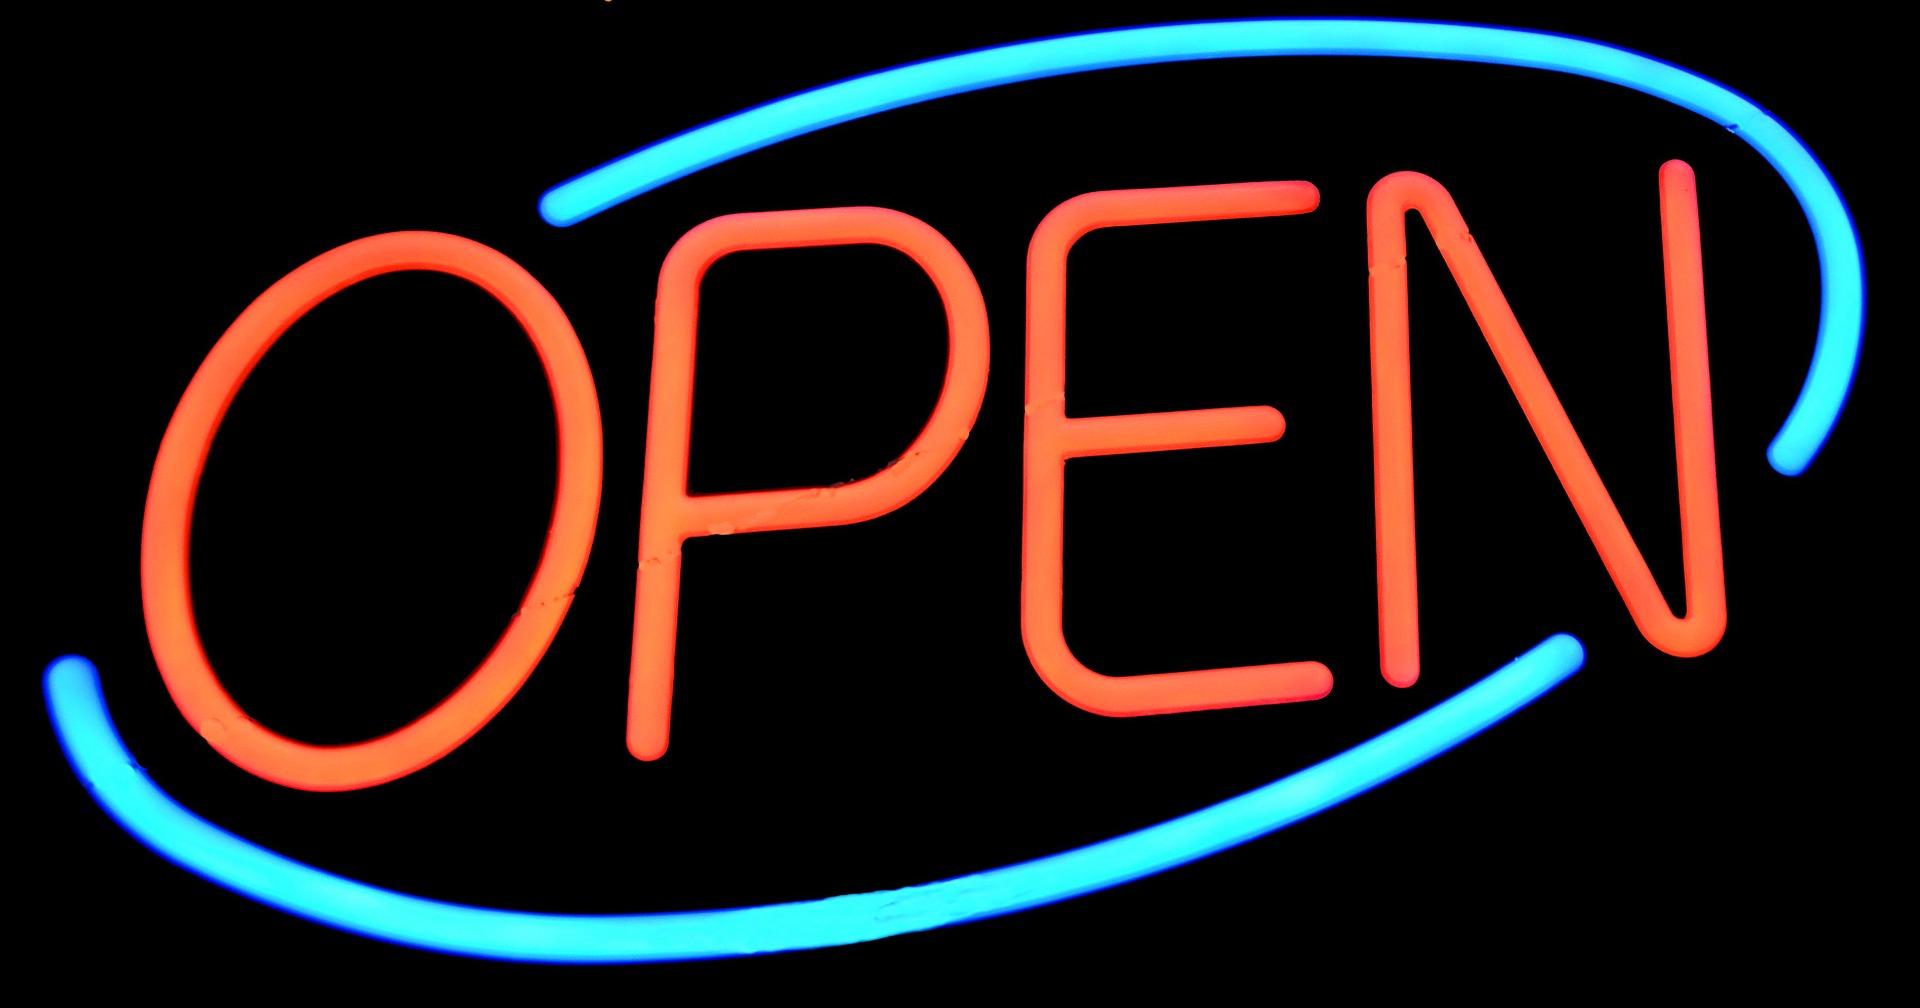 open-sign-1617495_1920.jpg